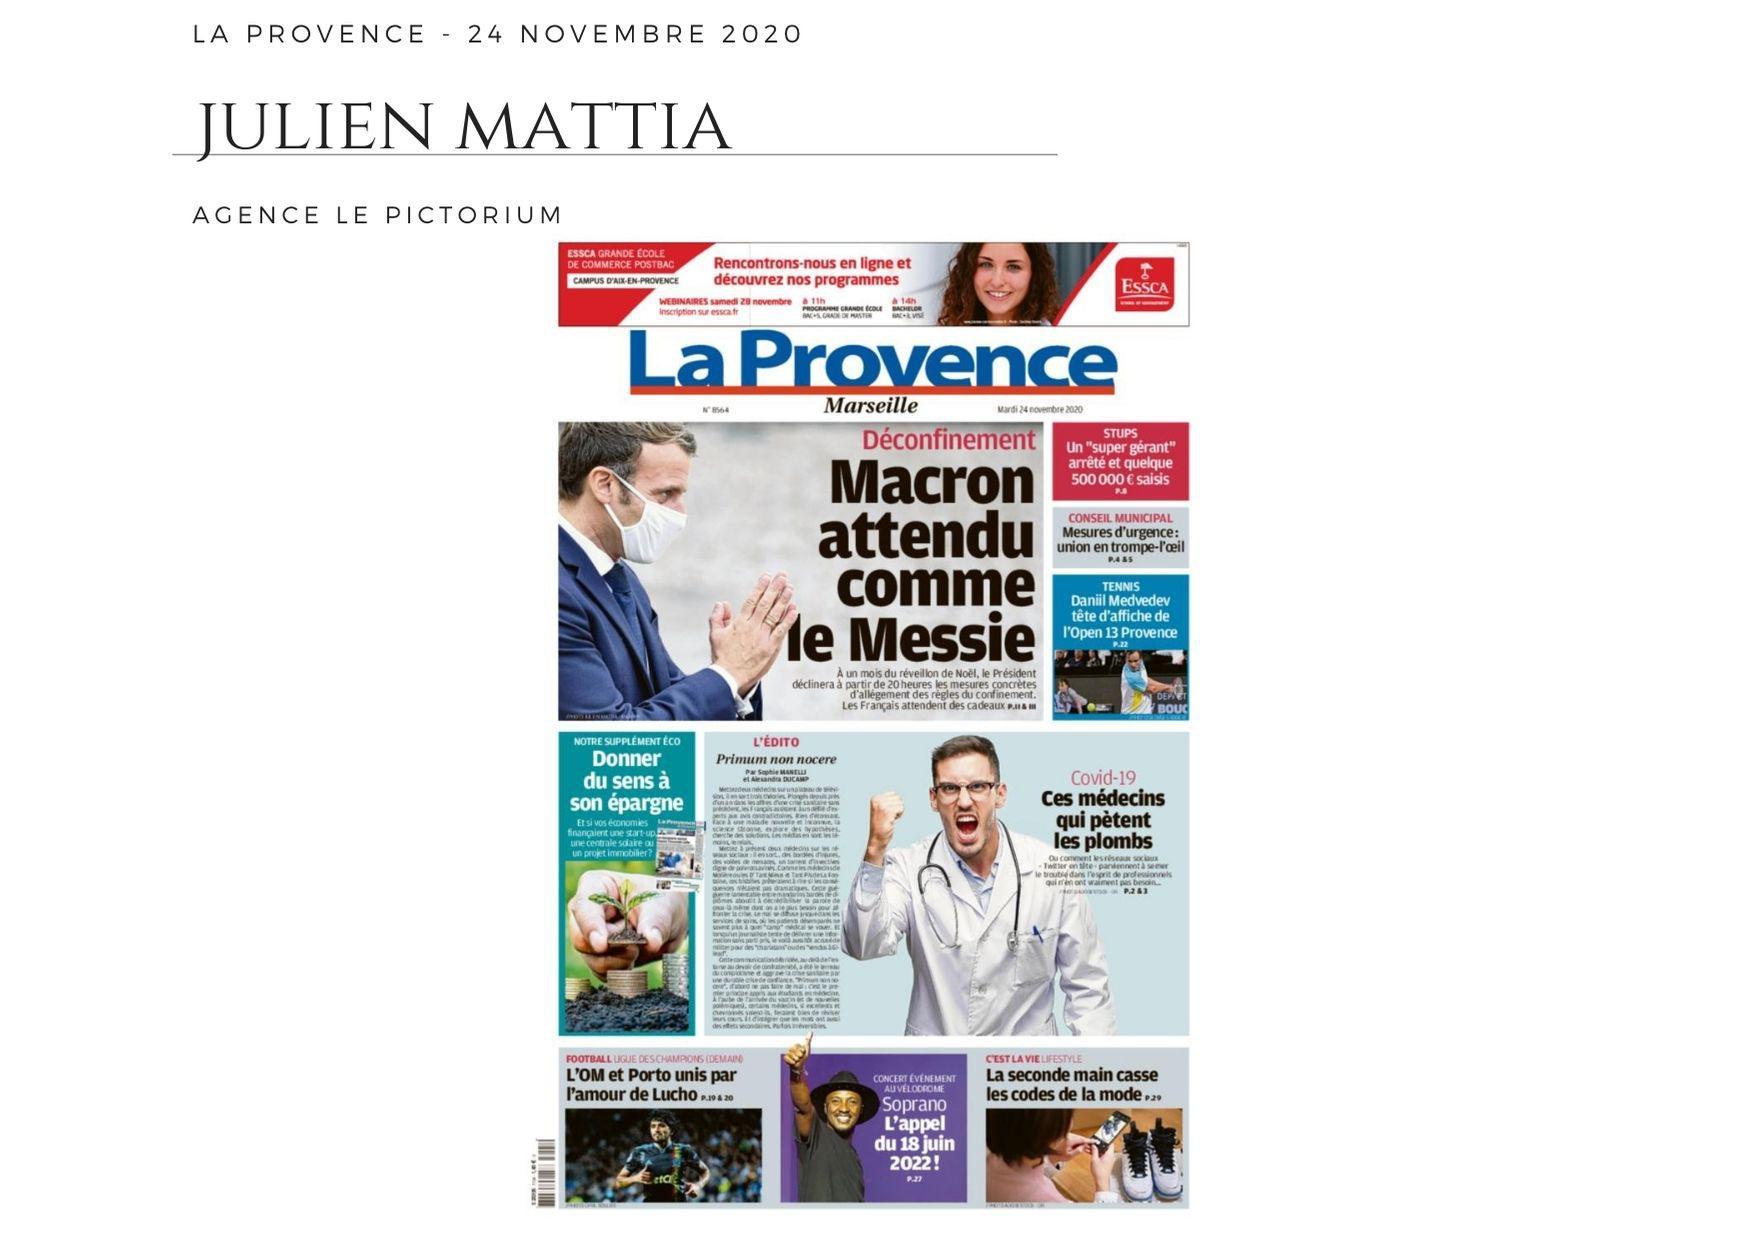 La Provence - 24 novembre 2020